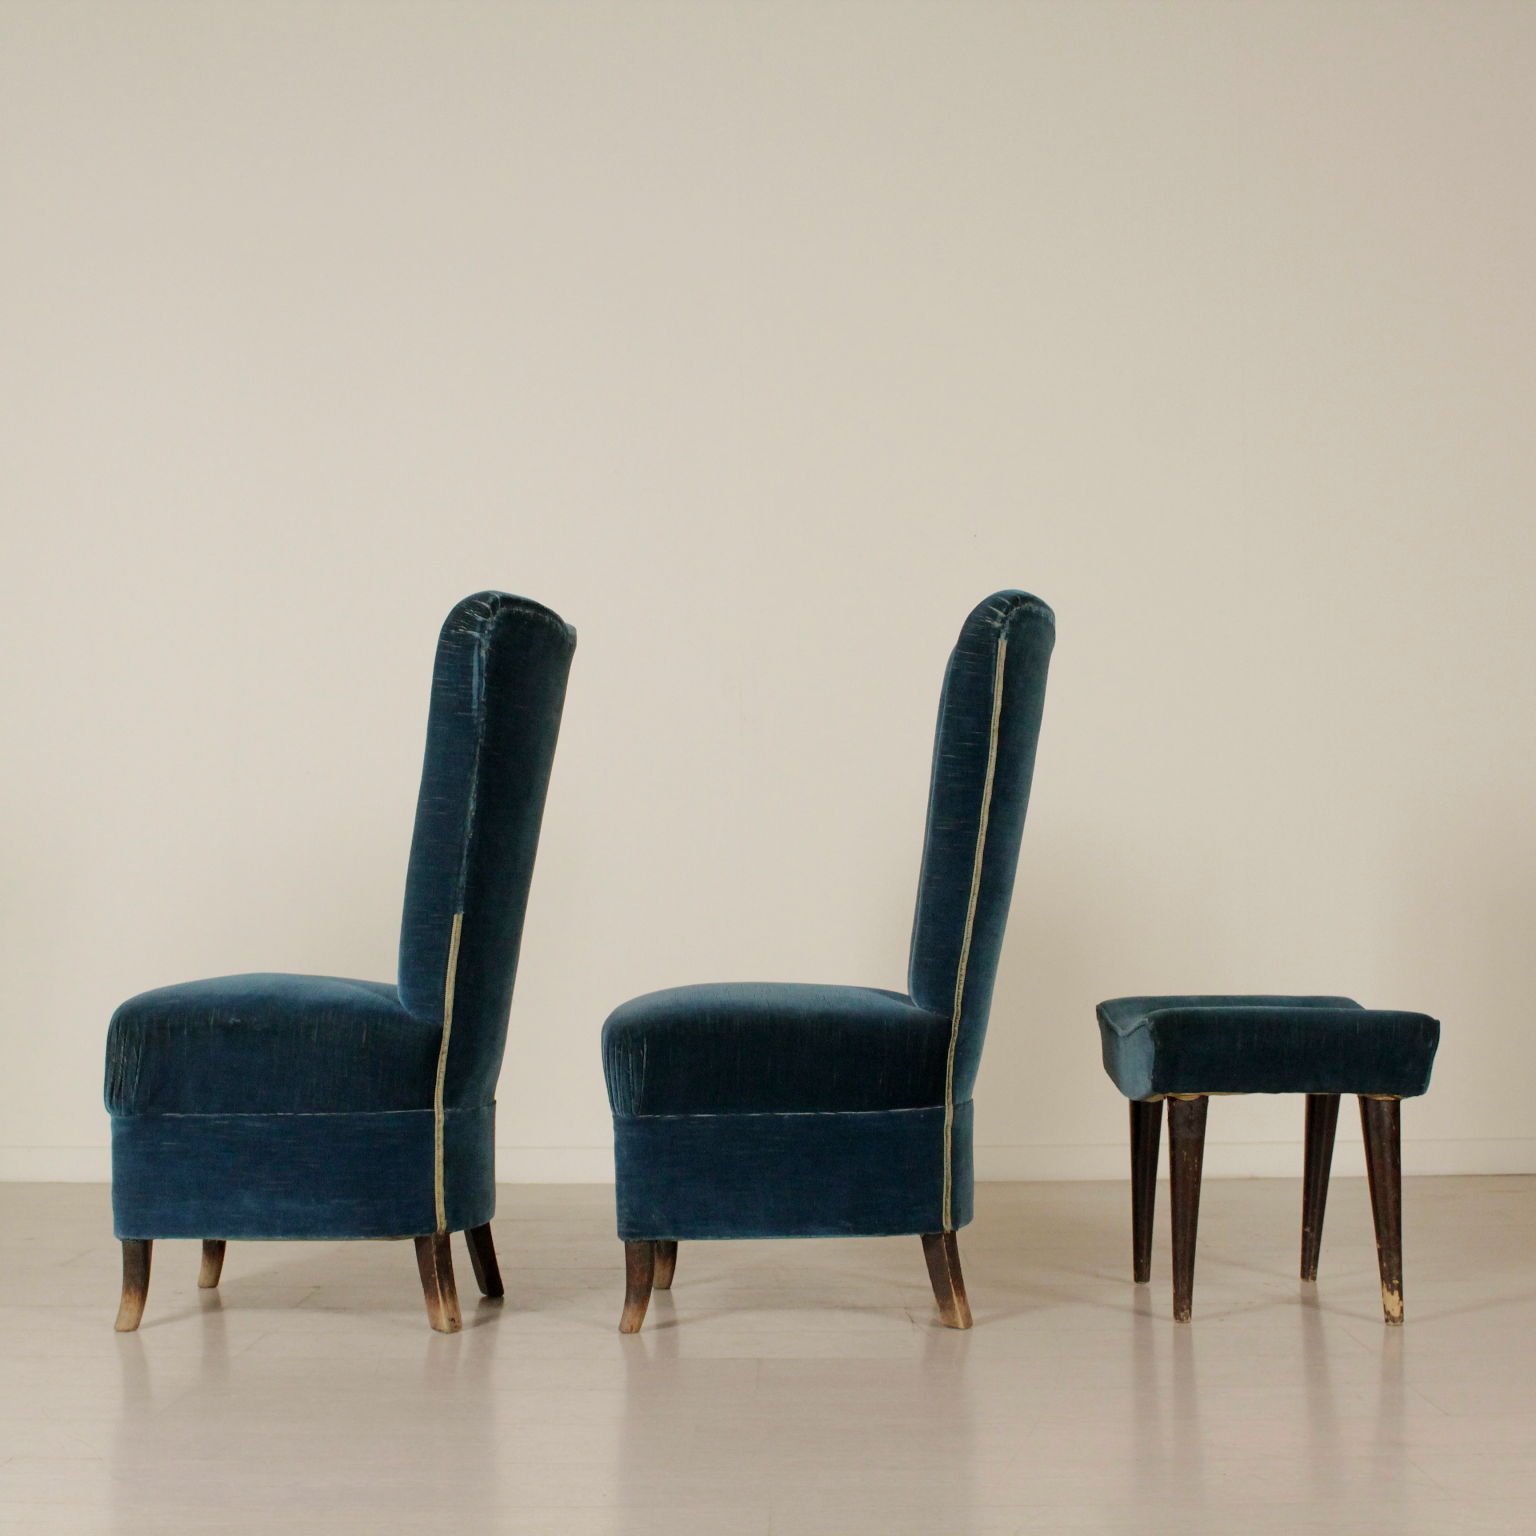 Sessel 50er Jahre - Sessel - Modernes design - dimanoinmano.it